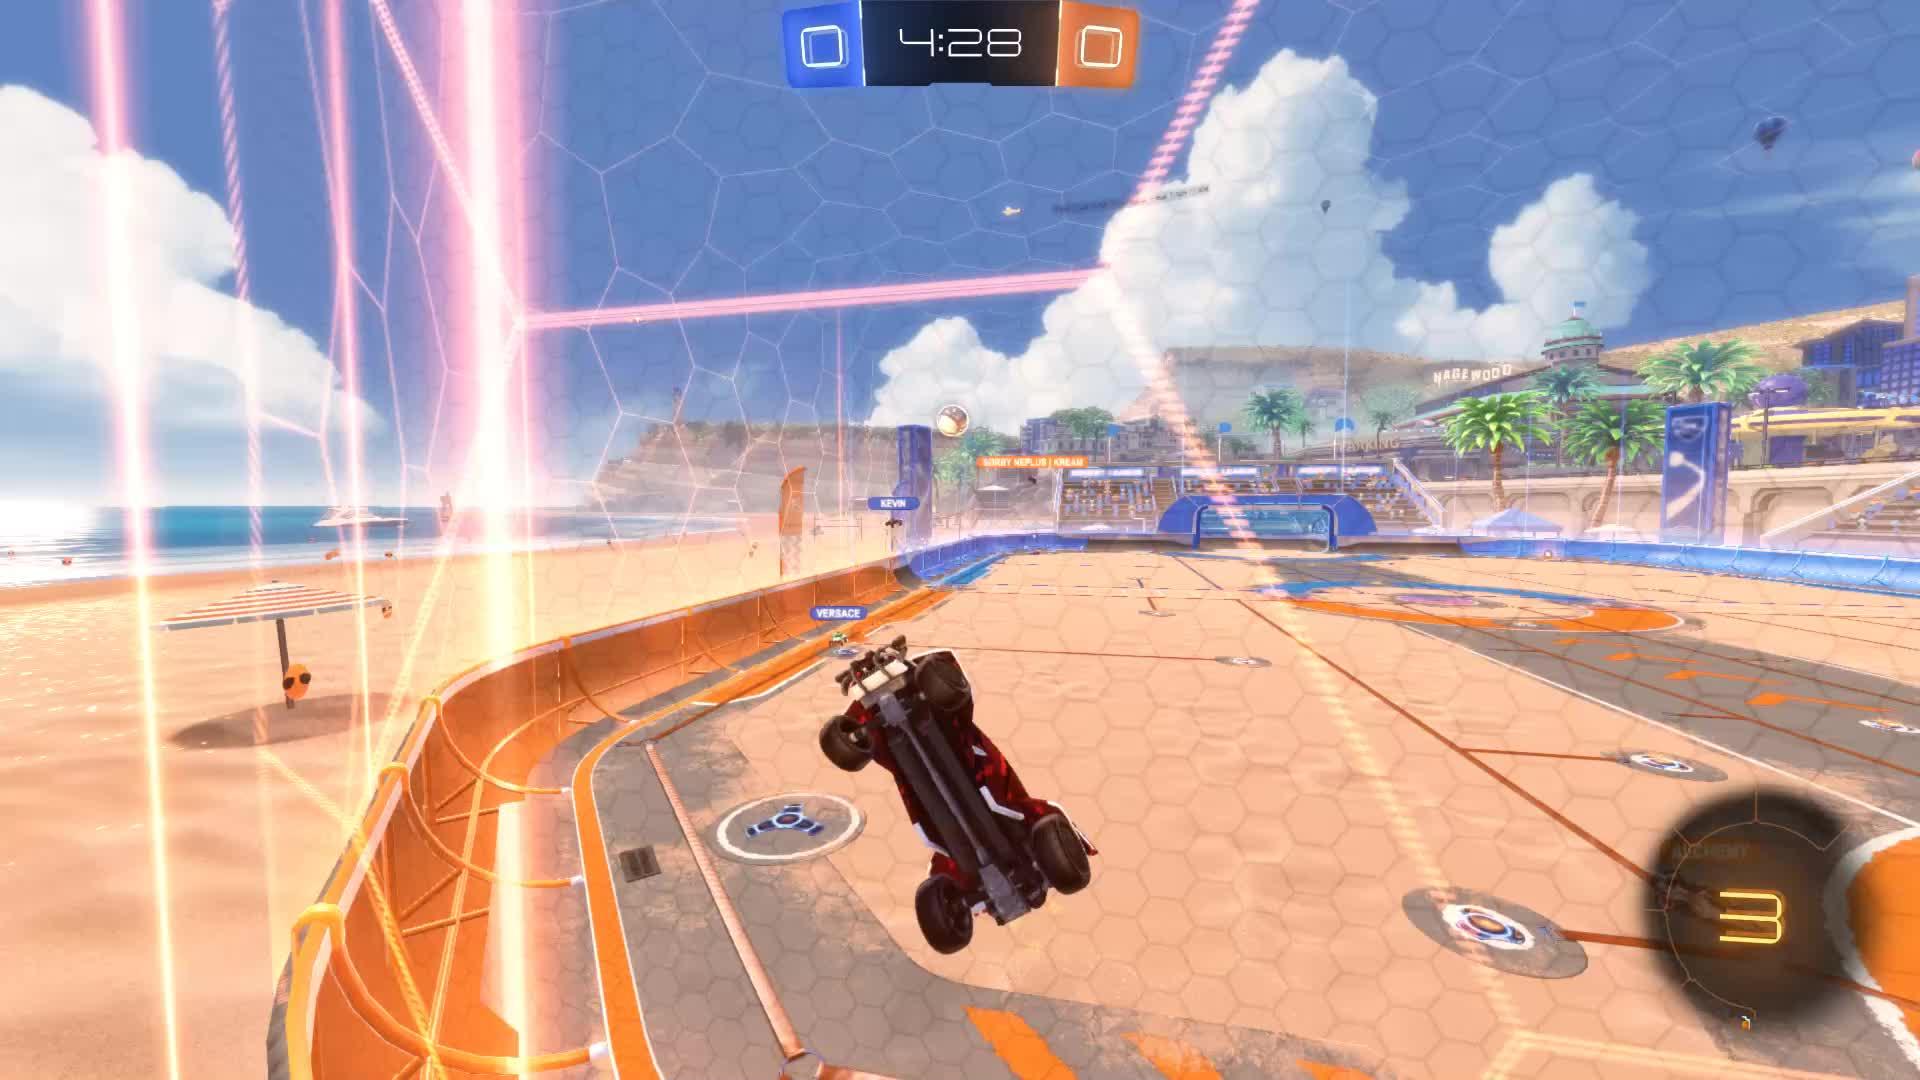 Felixx, Gif Your Game, GifYourGame, Goal, Rocket League, RocketLeague, Goal 1: Alchemy GIFs